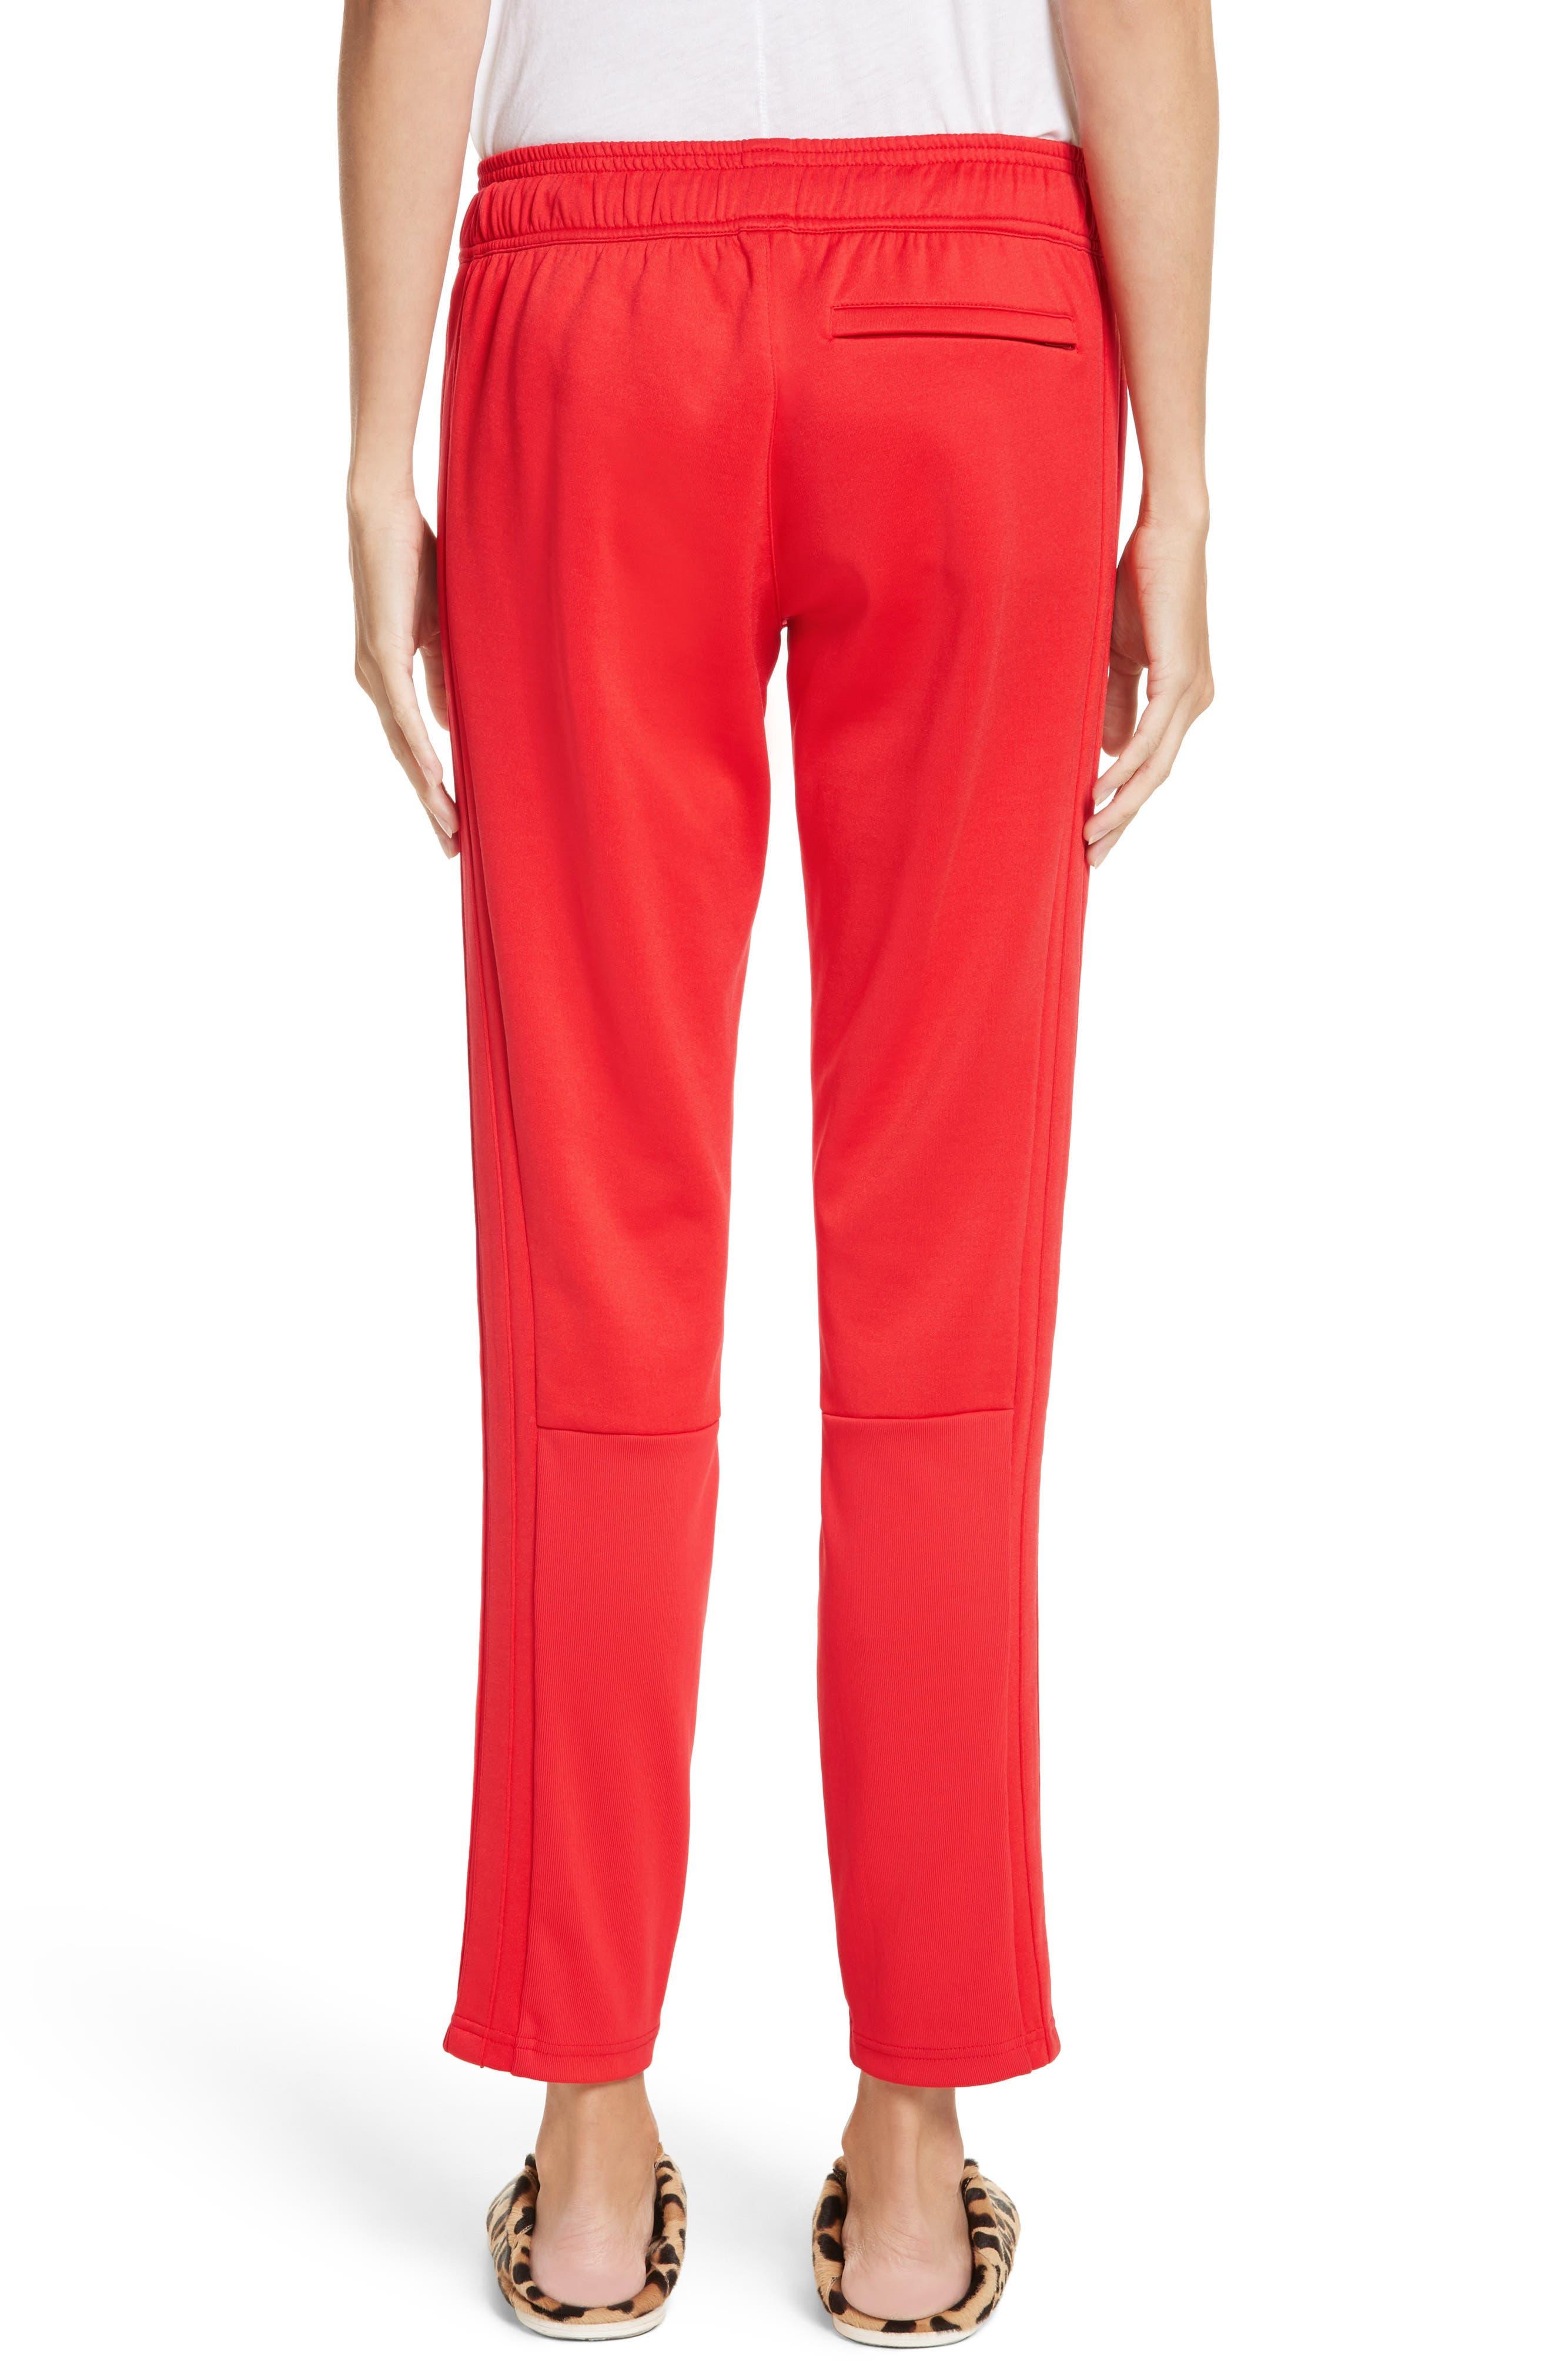 PSWL Jersey Track Pants,                             Alternate thumbnail 3, color,                             Poppy